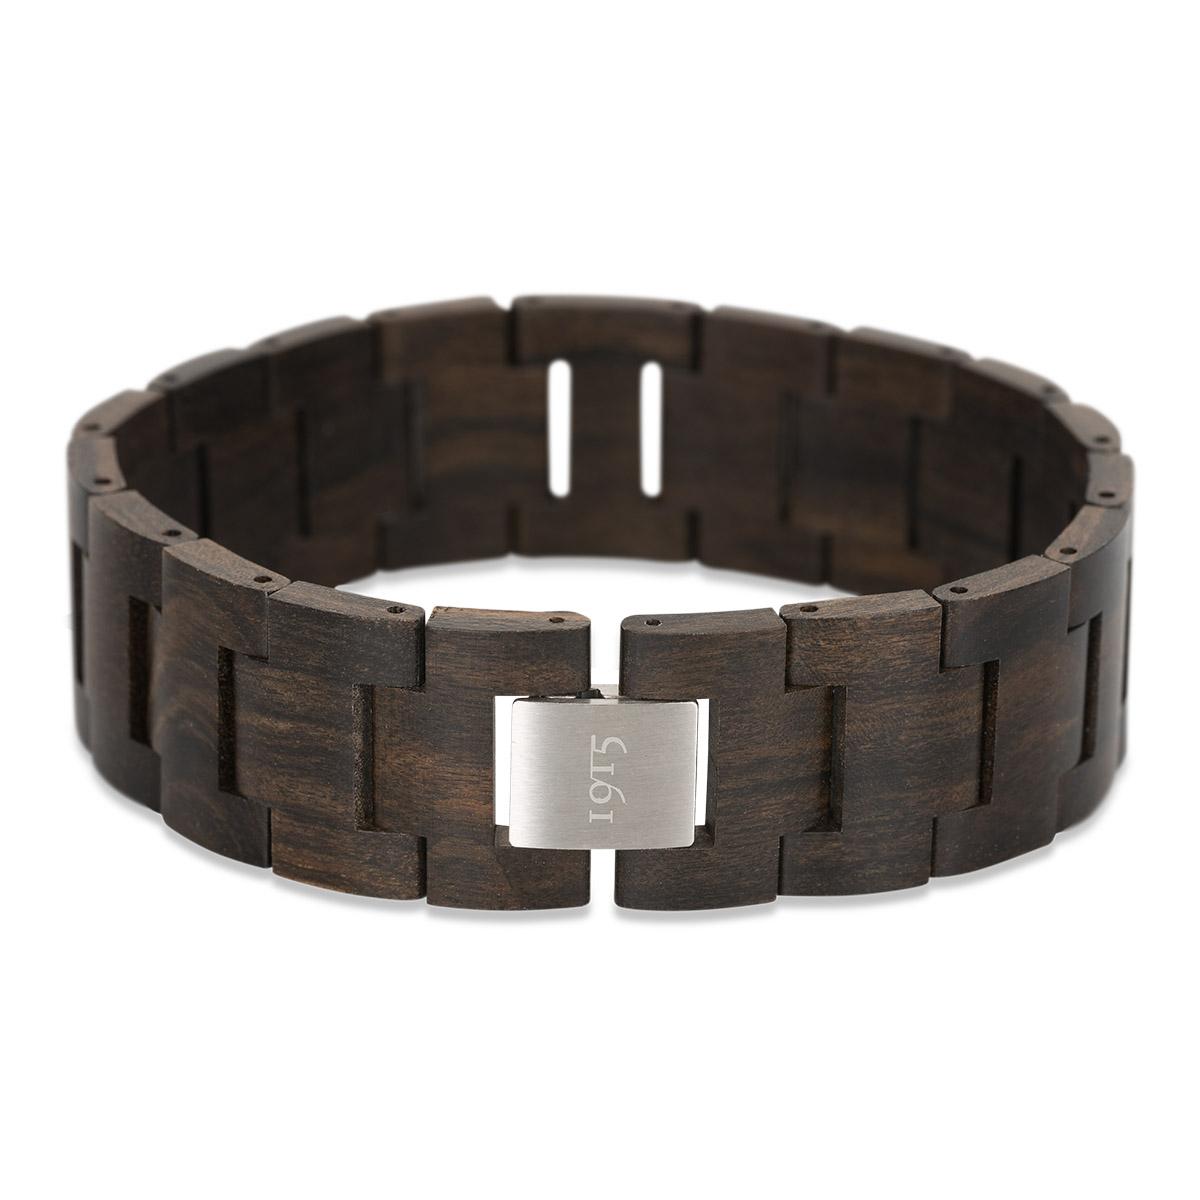 1915 watches - 1915 bracelet sandel